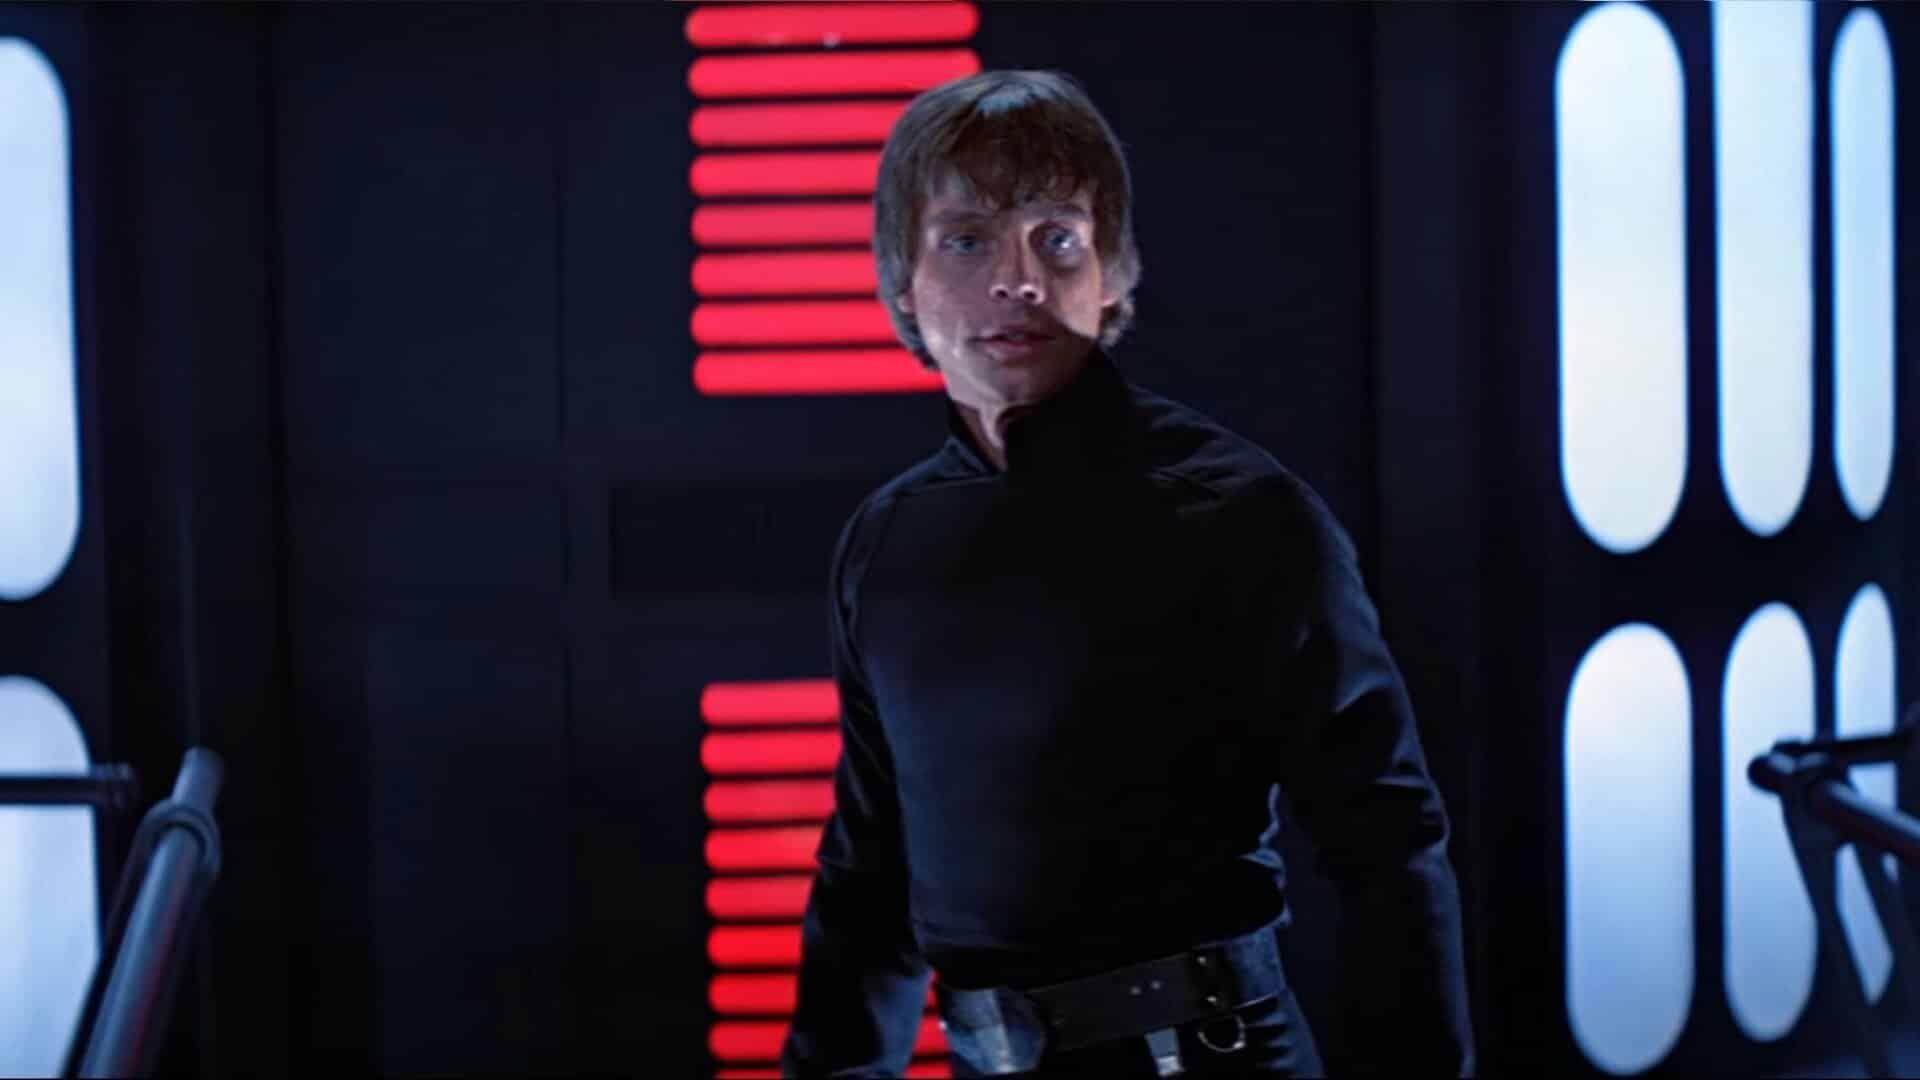 Luke Skywalker retorno del jedi